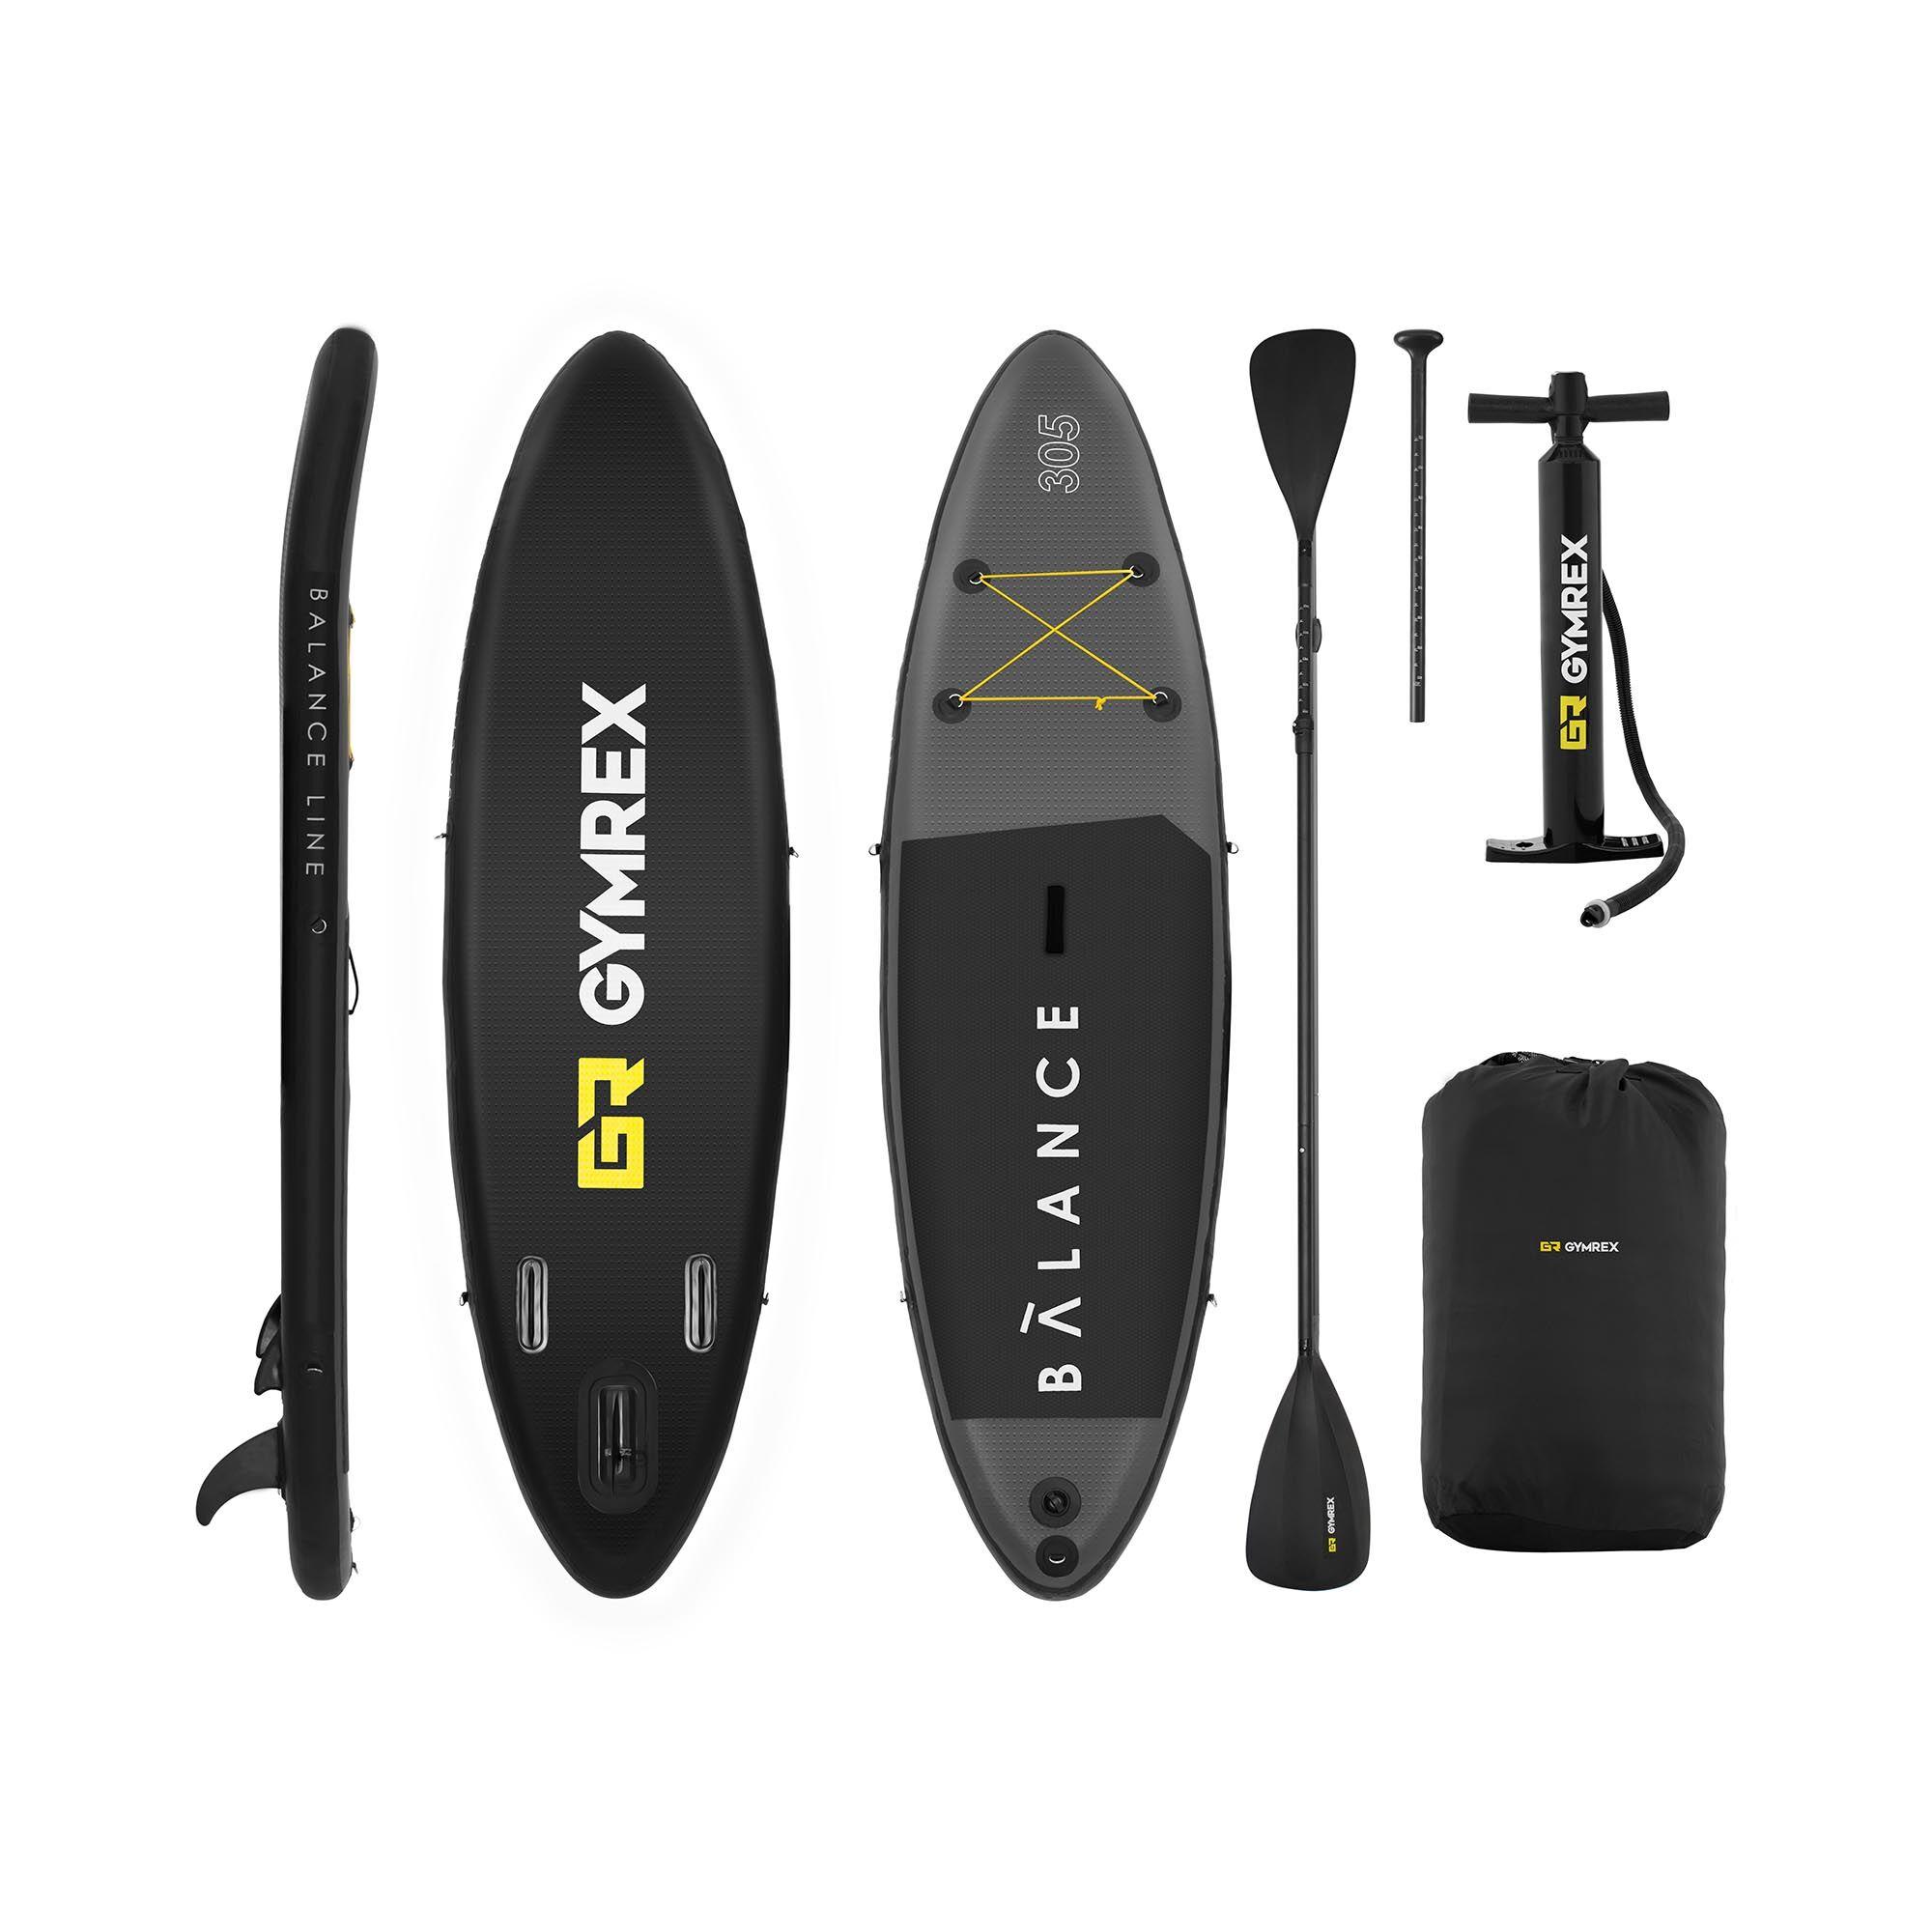 Gymrex Paddle-board - 135 kg - 305 x 79 x 15 cm GR-SPB305